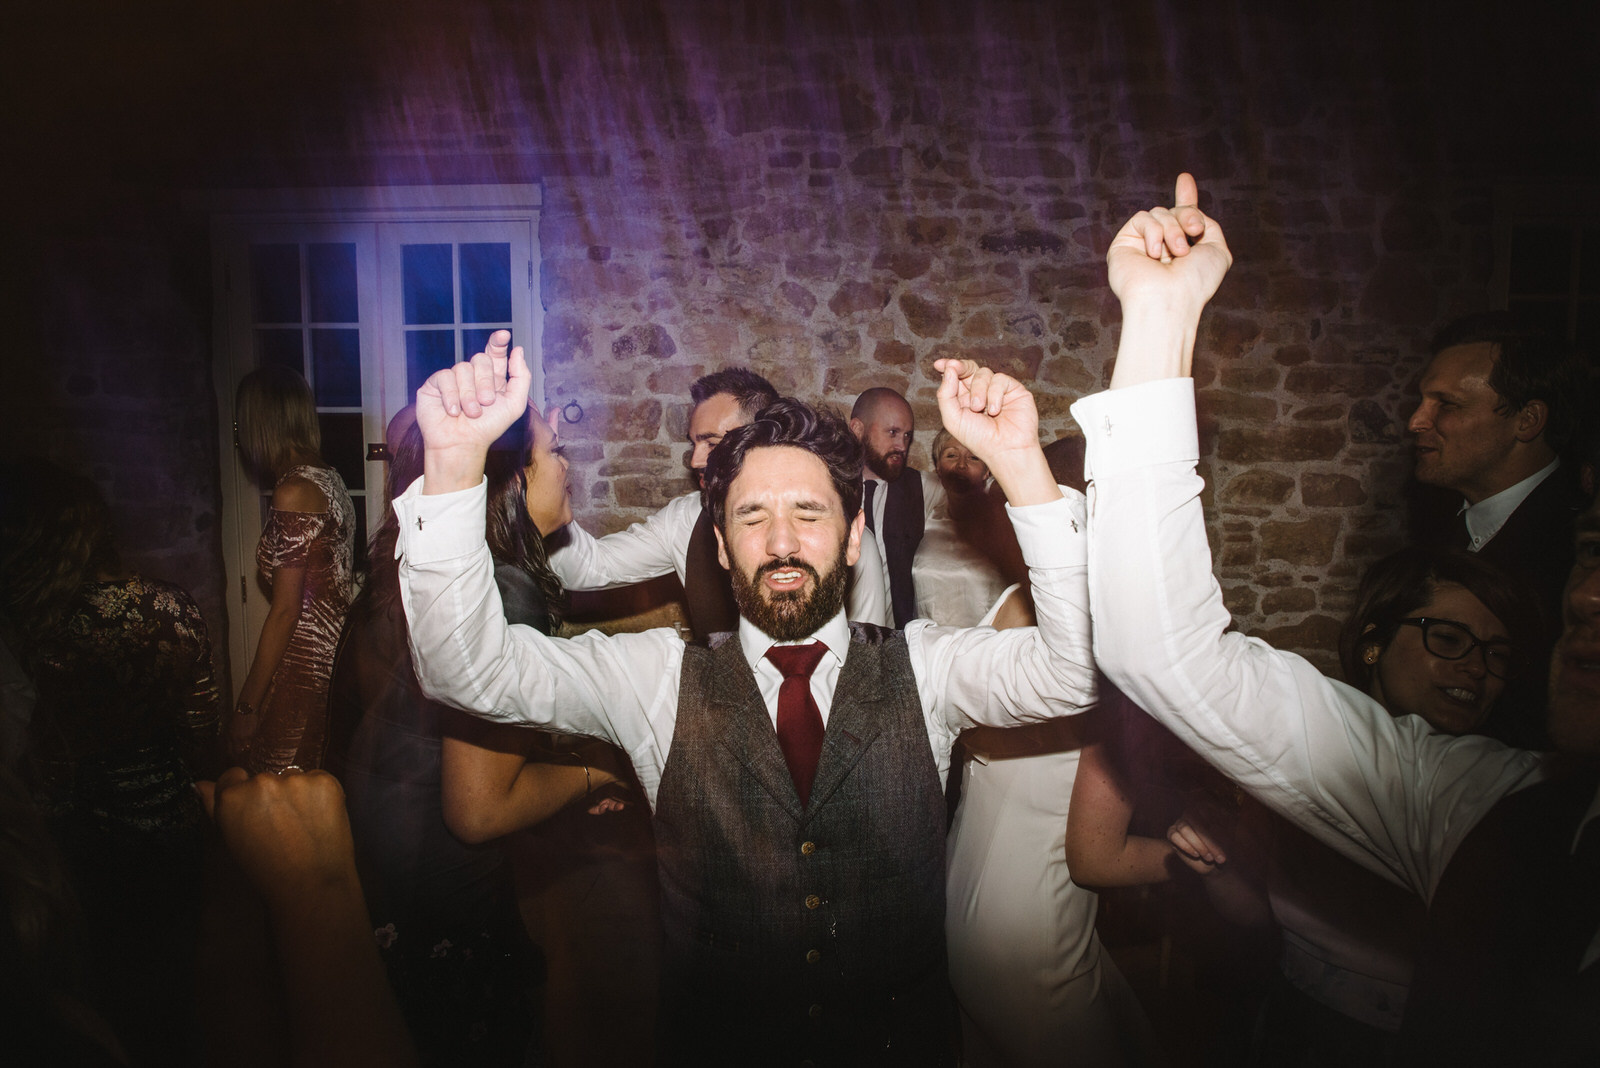 044-COLSTOUN-HOUSE-WEDDING-ALTERNATIVE-WEDDING-PHOTOGRAPHER-GLASGOW-WEDDING-PHOTOGRAPHER-STYLISH-SCOTTISH-WEDDING.JPG